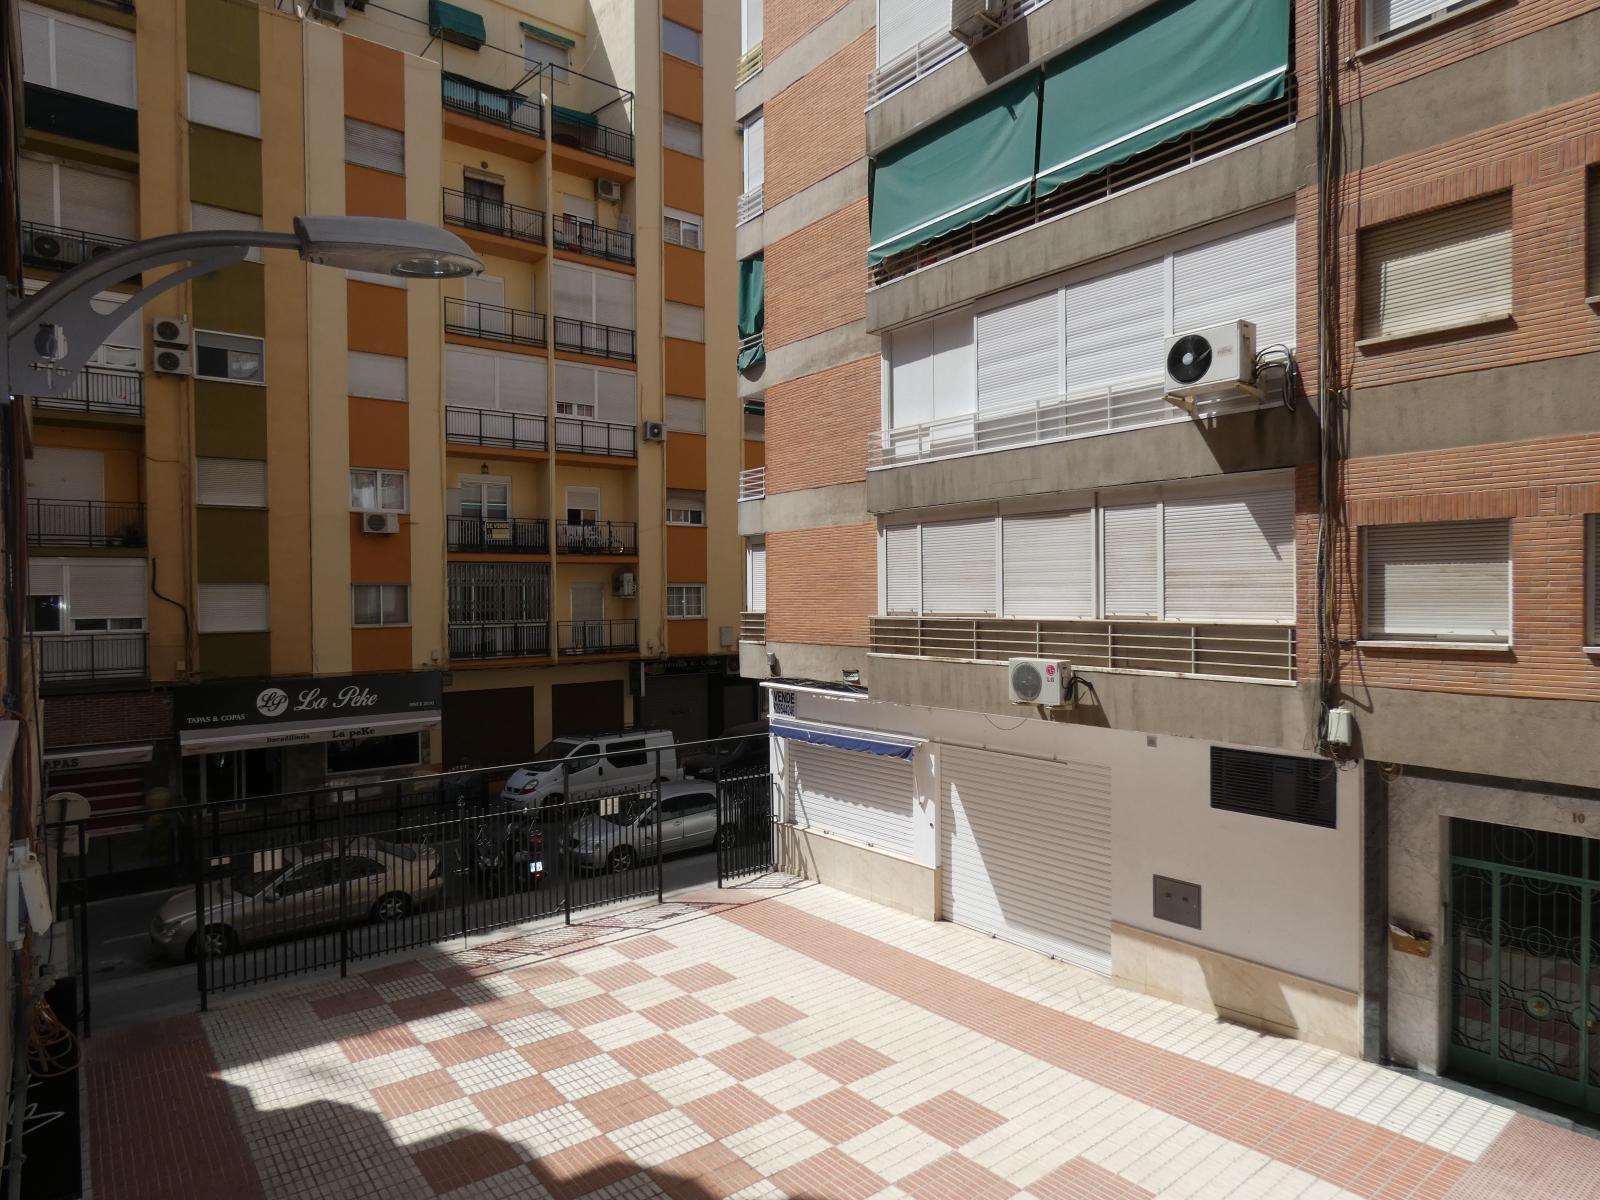 Flat for rent in Camino de Ronda (Granada), 850 €/month (Season, Students)